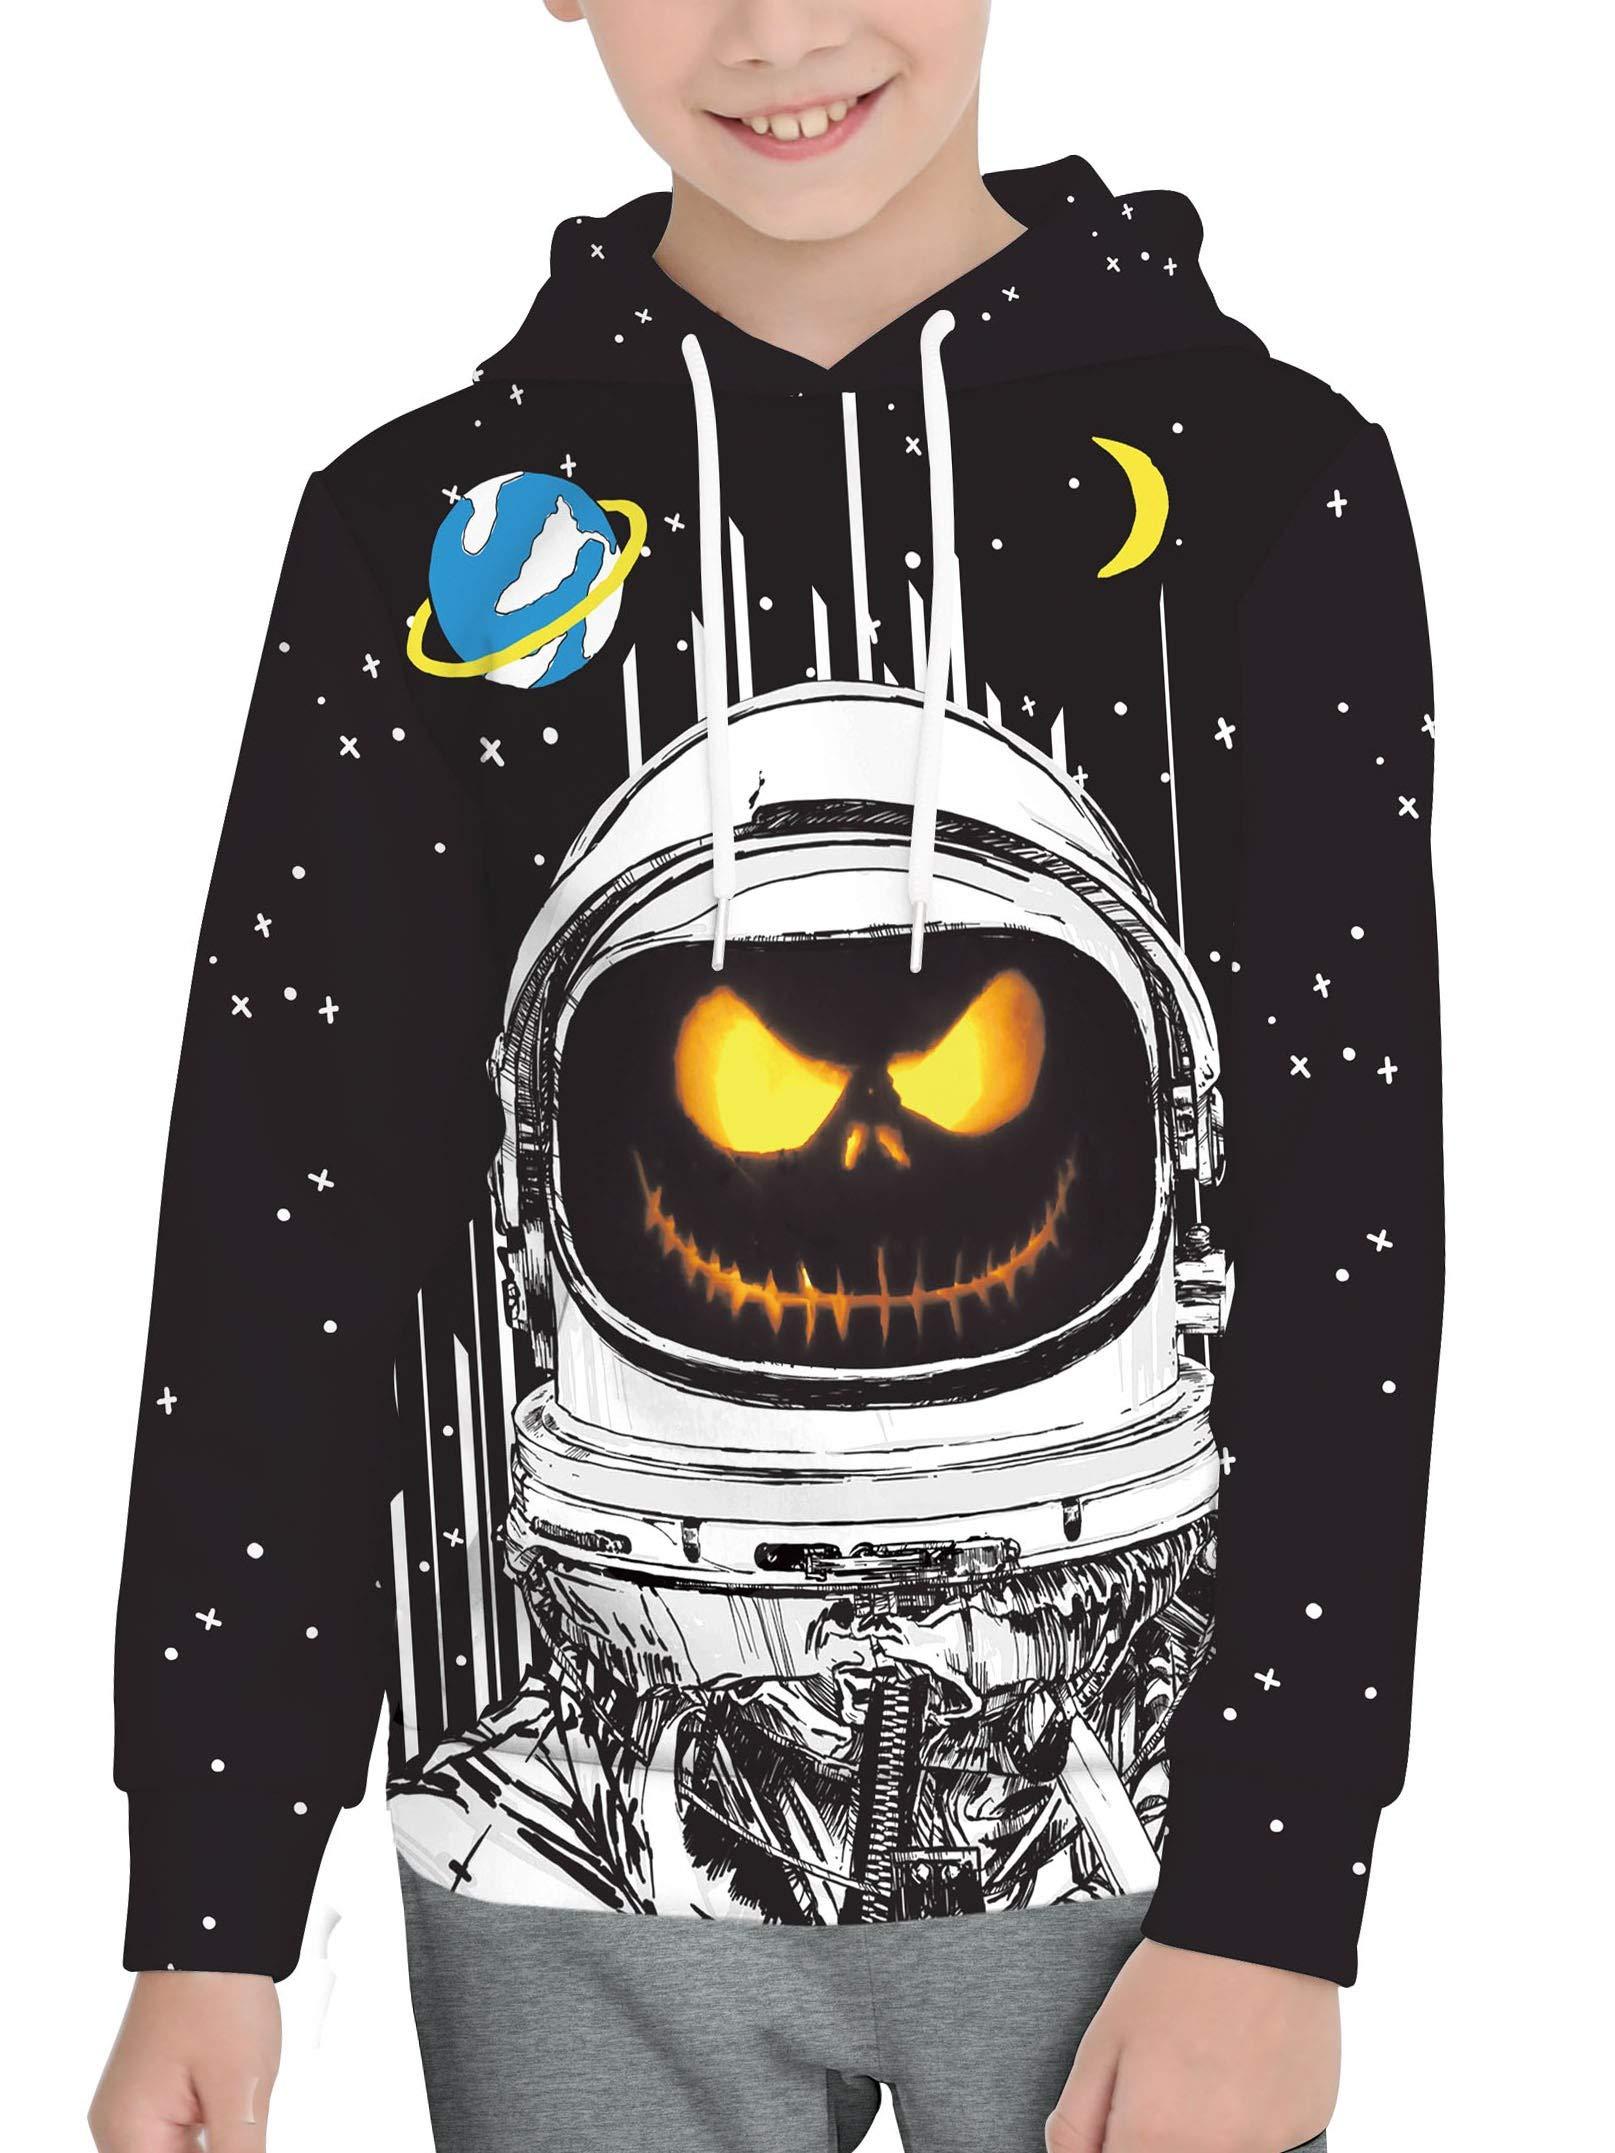 BesserBay Unisex Kid's Halloween Long Sleeve Hoodies Graphic Astronaut Printing Sweatshirts Black Pullover Tops 2-4T